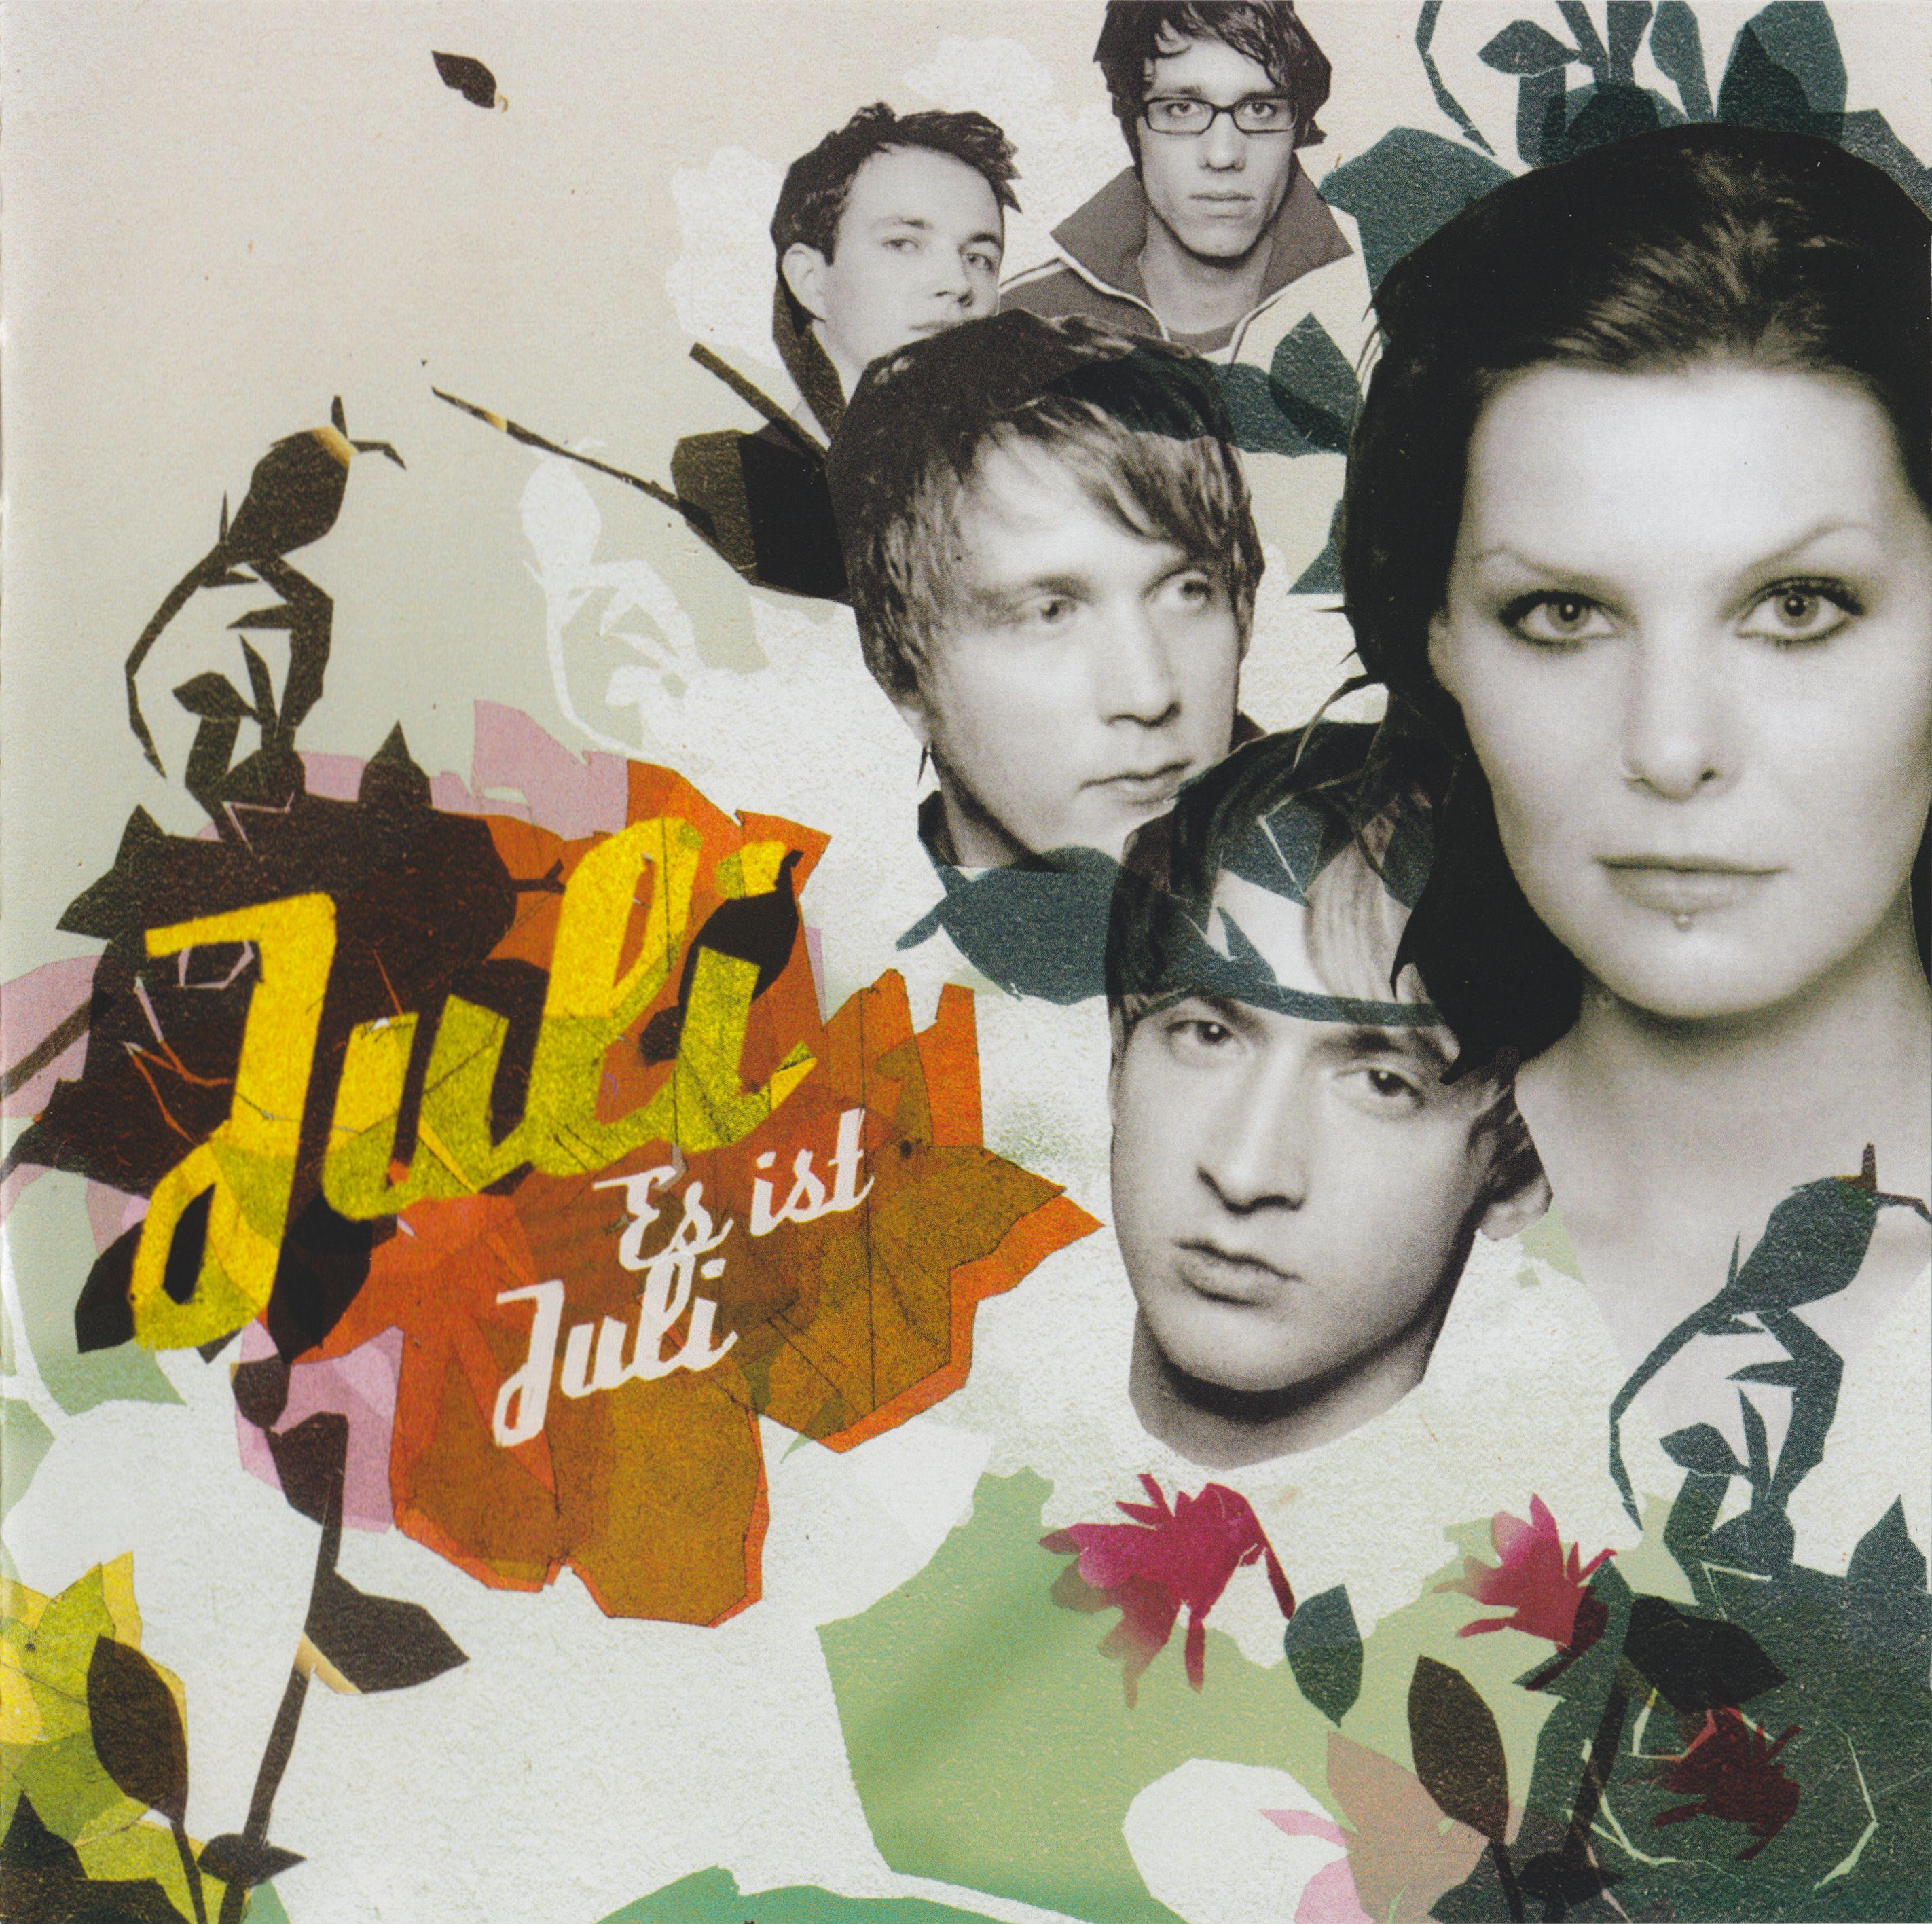 Juli - Es Ist Juli album cover